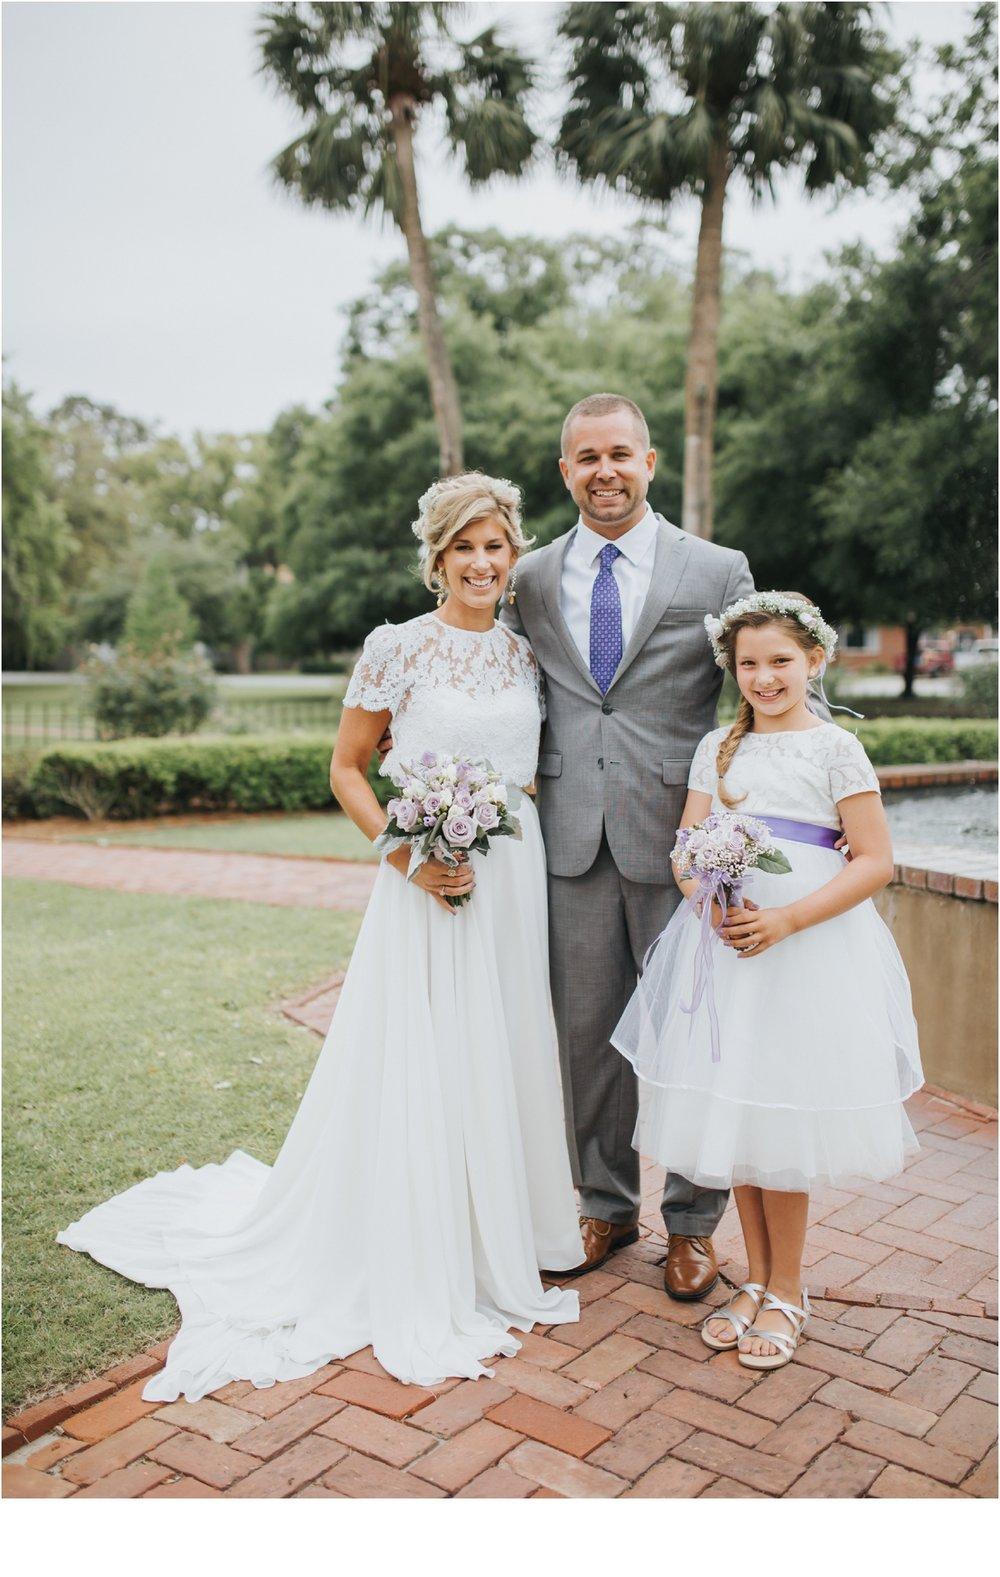 Rainey_Gregg_Photography_St._Simons_Island_Georgia_California_Wedding_Portrait_Photography_1500.jpg